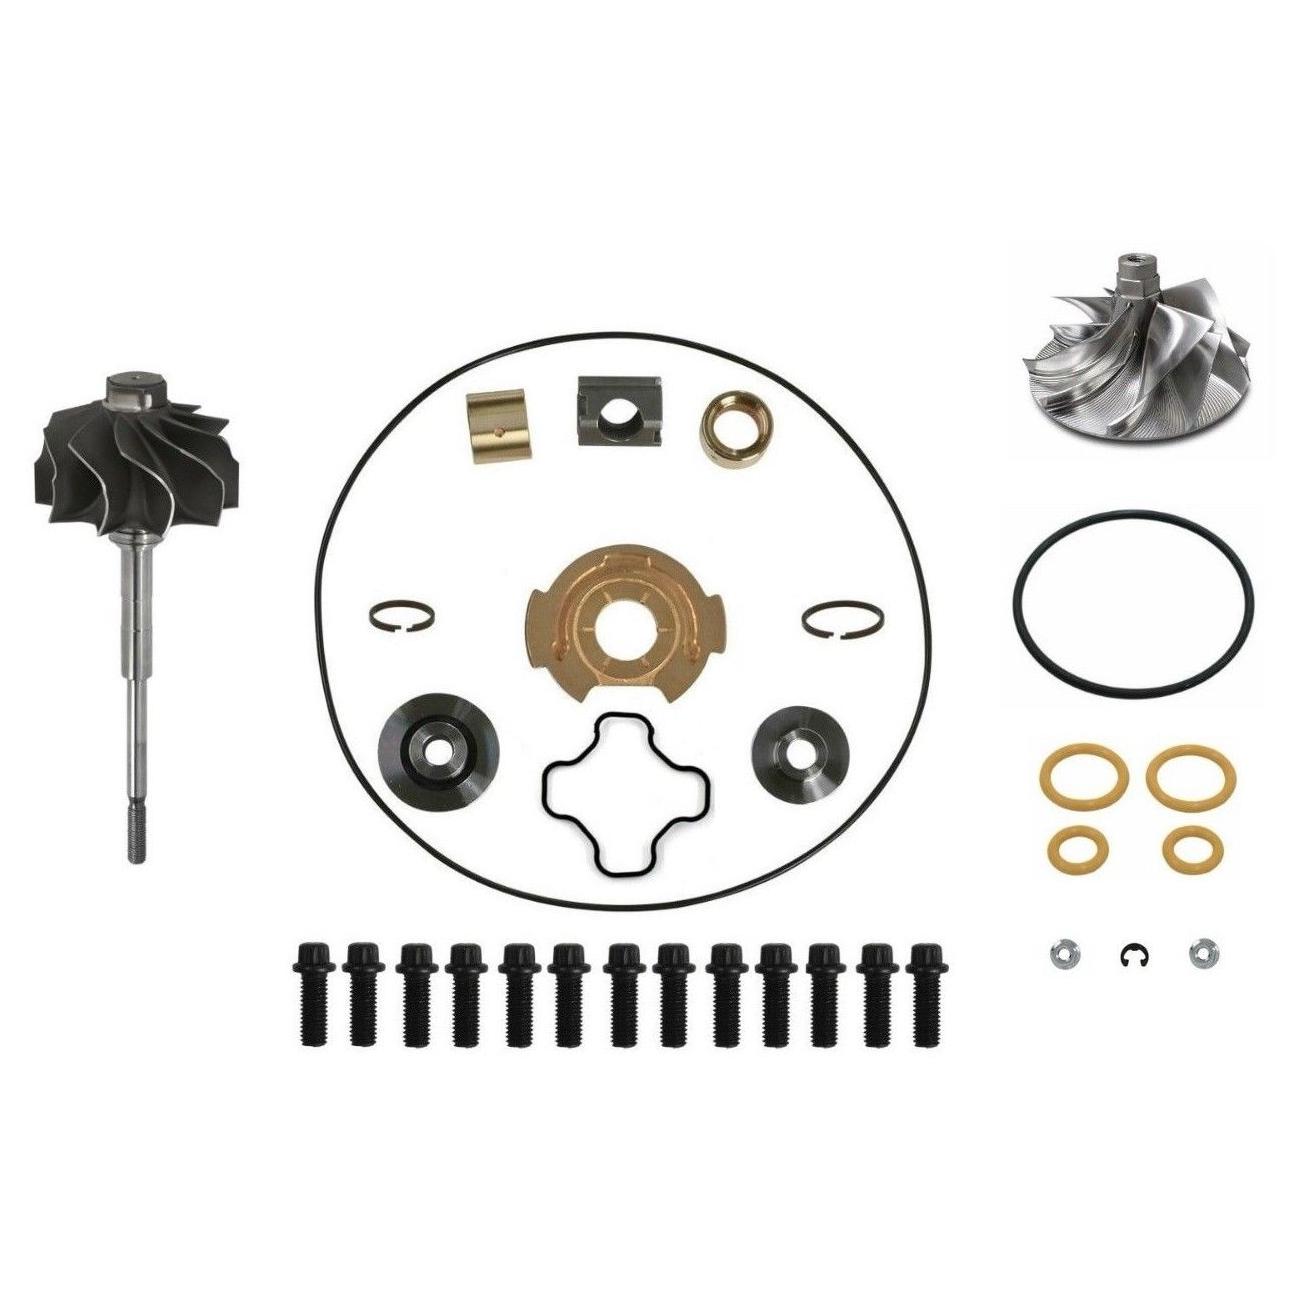 GTP38 Turbo Rebuild Kit Billet Compressor Wheel Turbine Shaft For 99-03 7.3L Ford Powerstroke Diesel